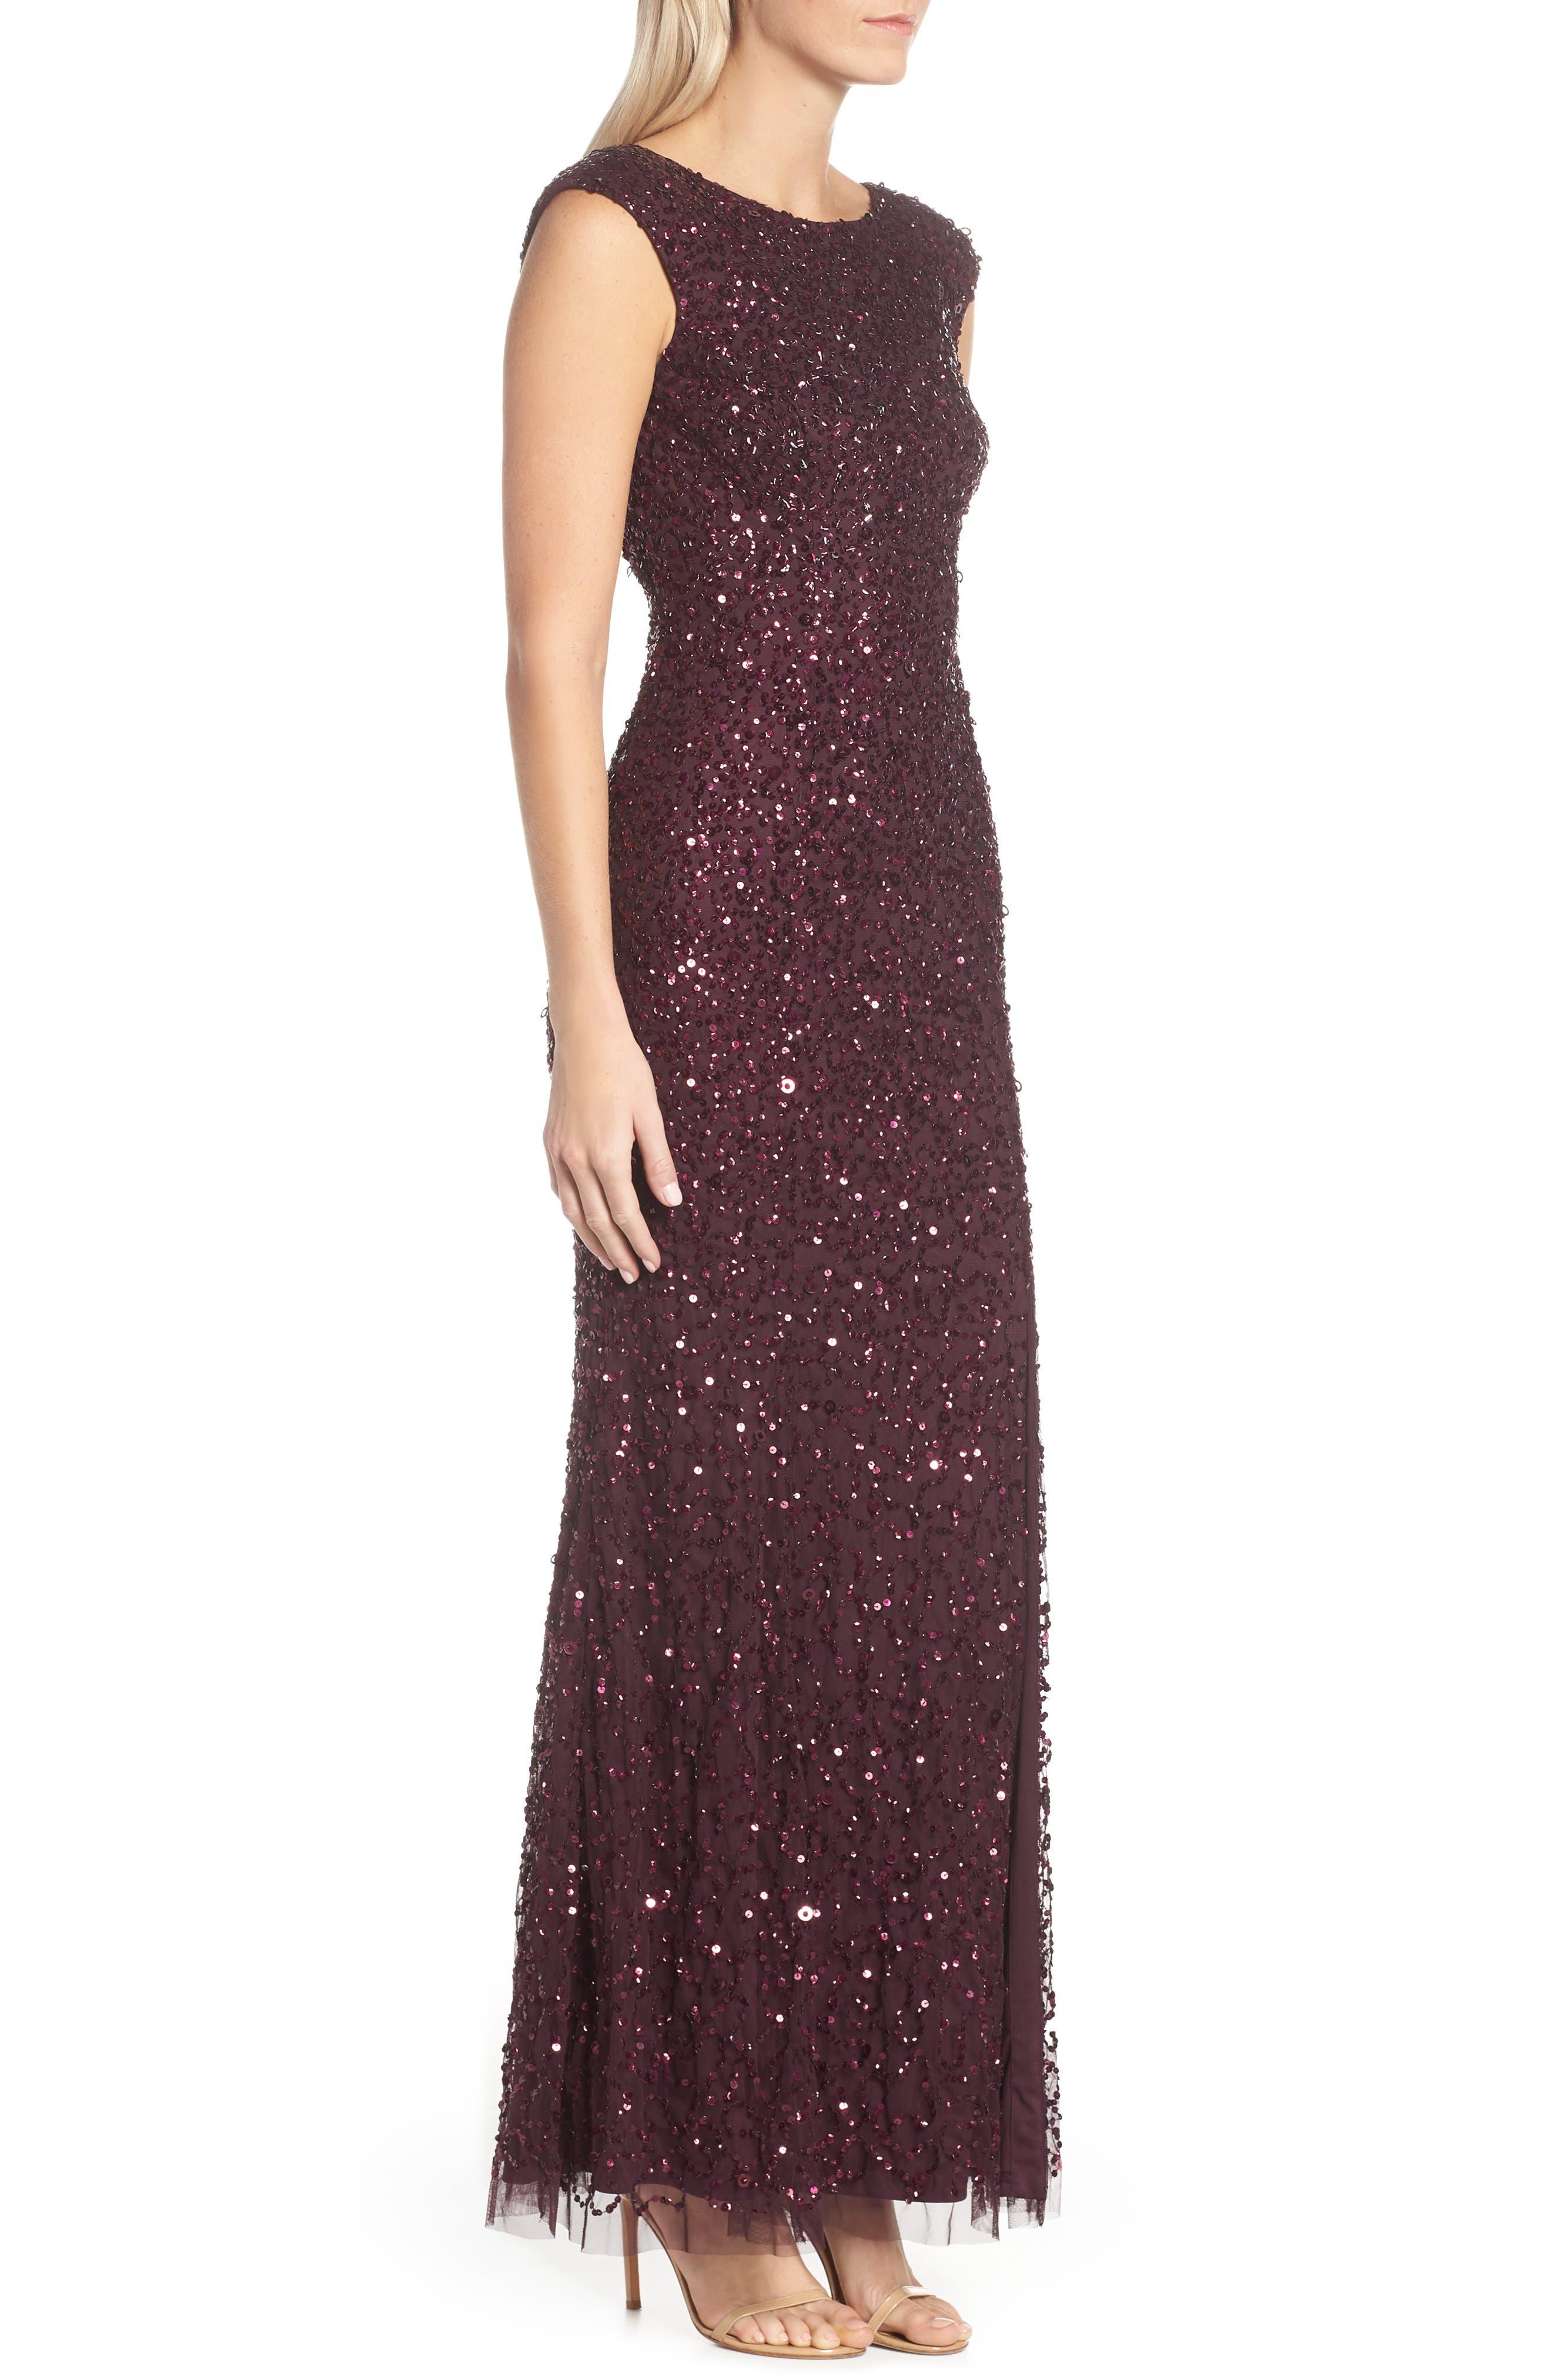 Sequin Evening Dress,                             Alternate thumbnail 3, color,                             NIGHT PLUM